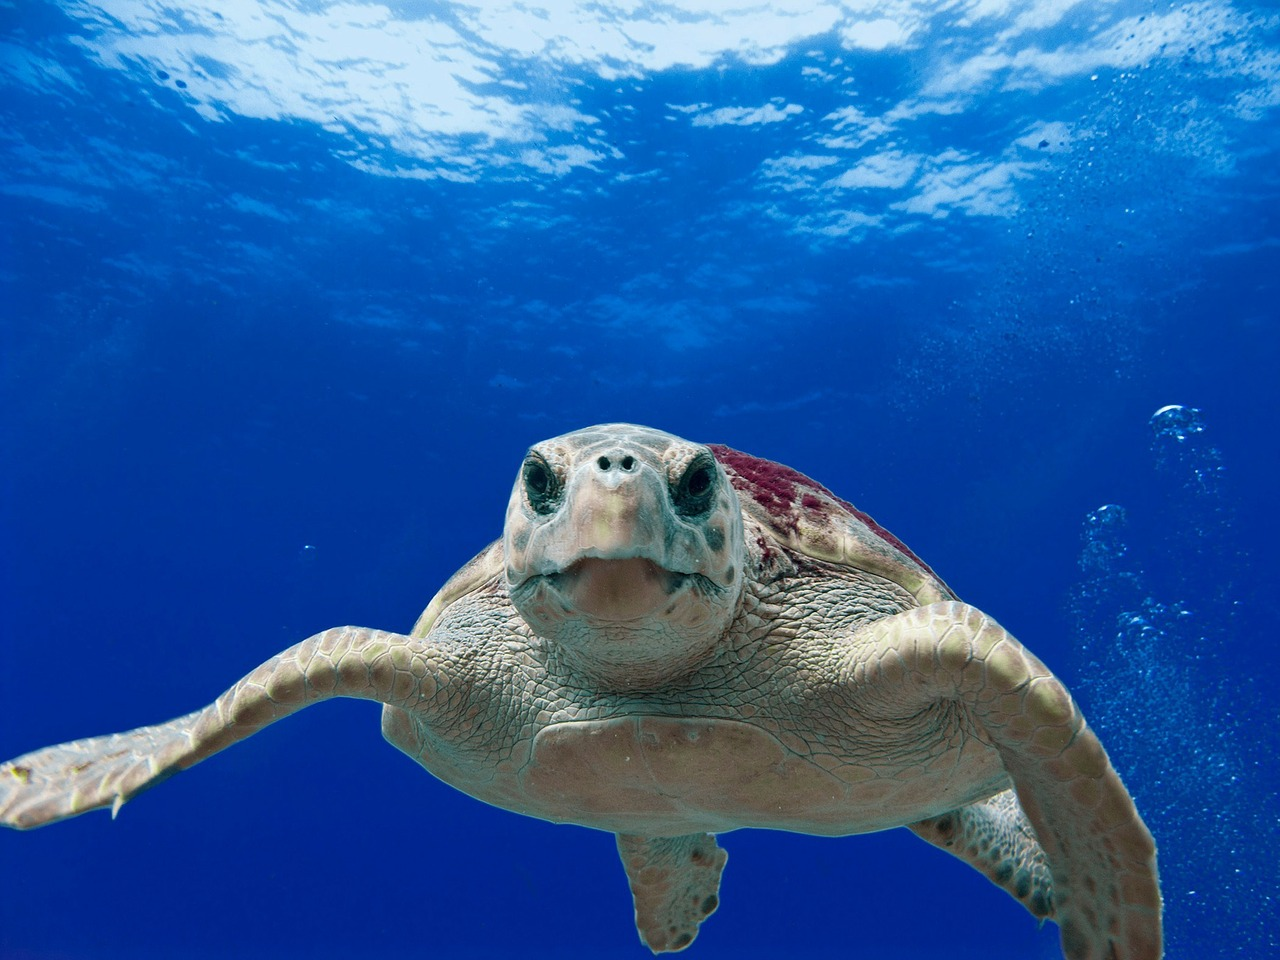 Do Sea Turtles Bite